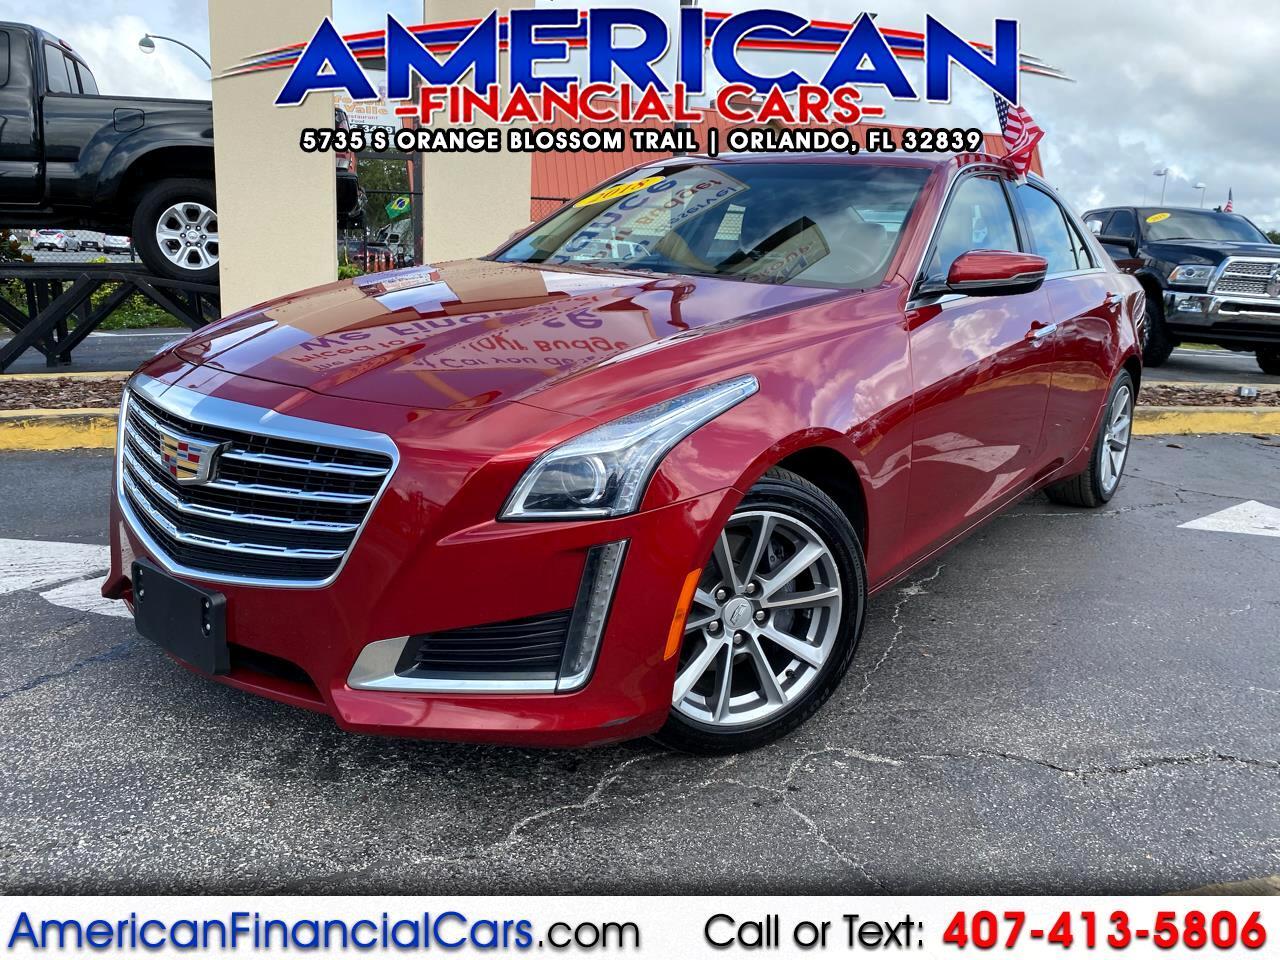 Cadillac CTS Sedan 4dr Sdn 2.0L Turbo Luxury RWD 2018